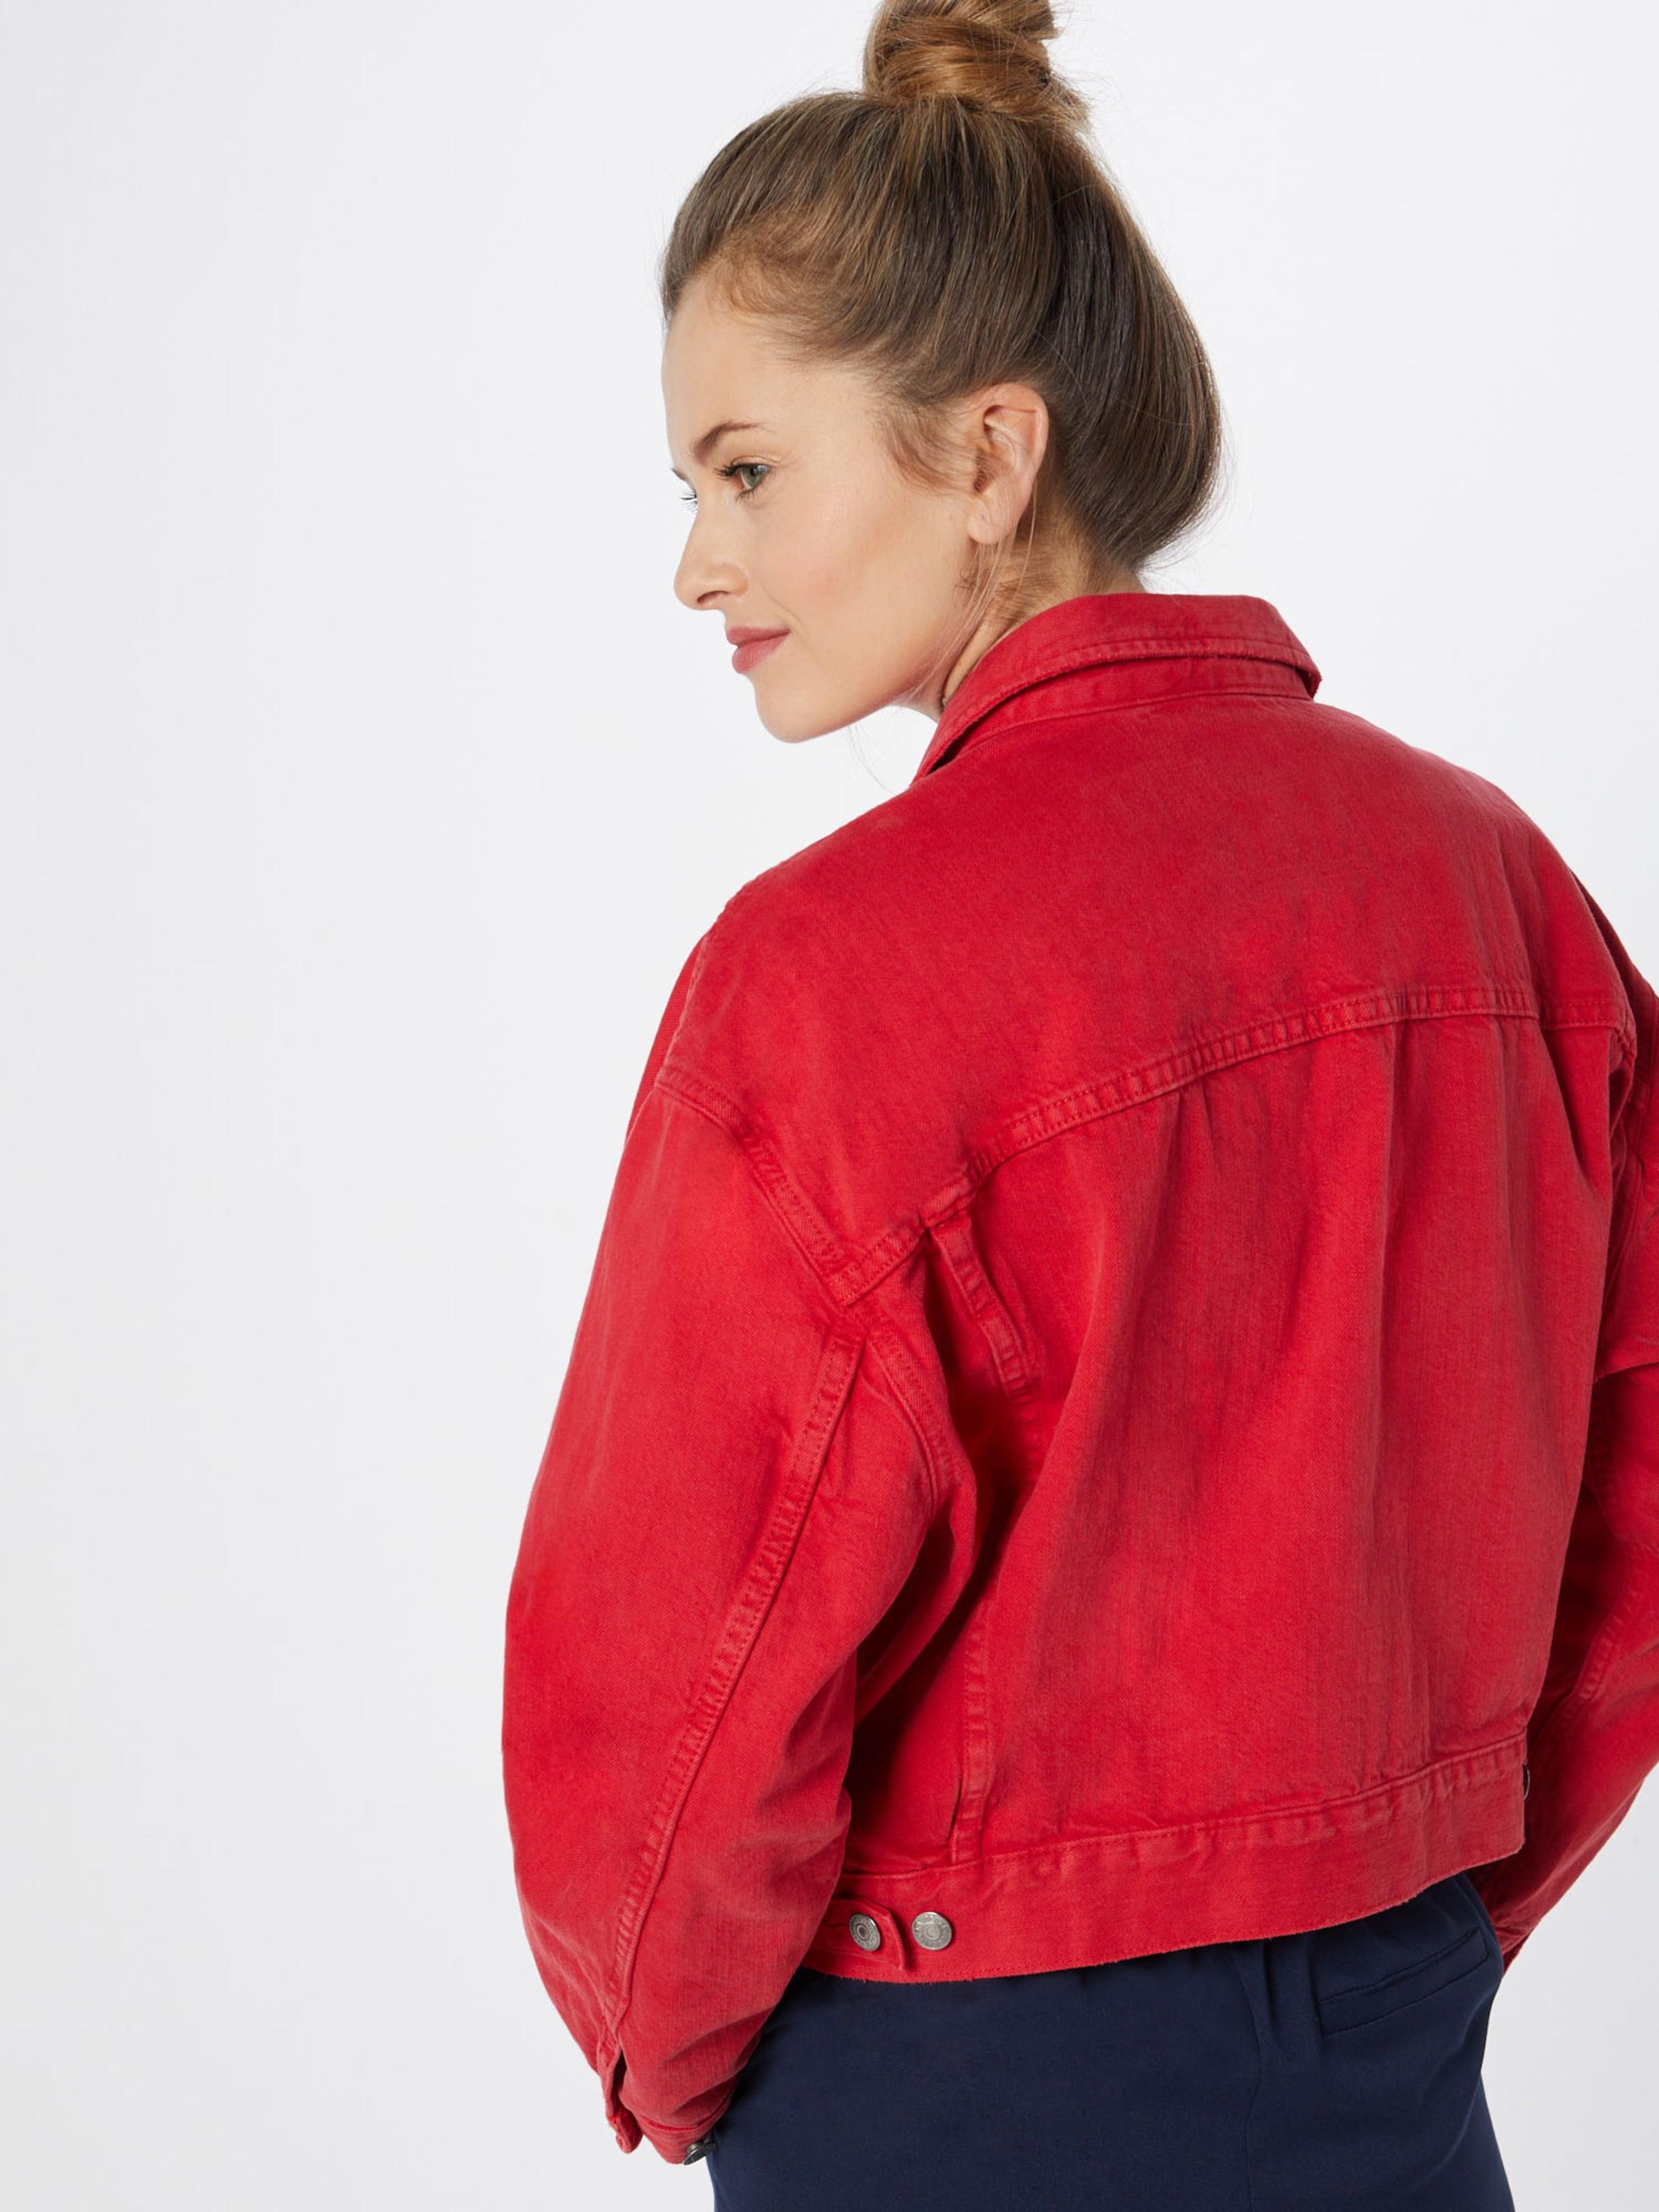 En Mi jacket' saison Ralph Rouge Lauren Trucker denim 'rlxd Polo Veste l135FcTKuJ